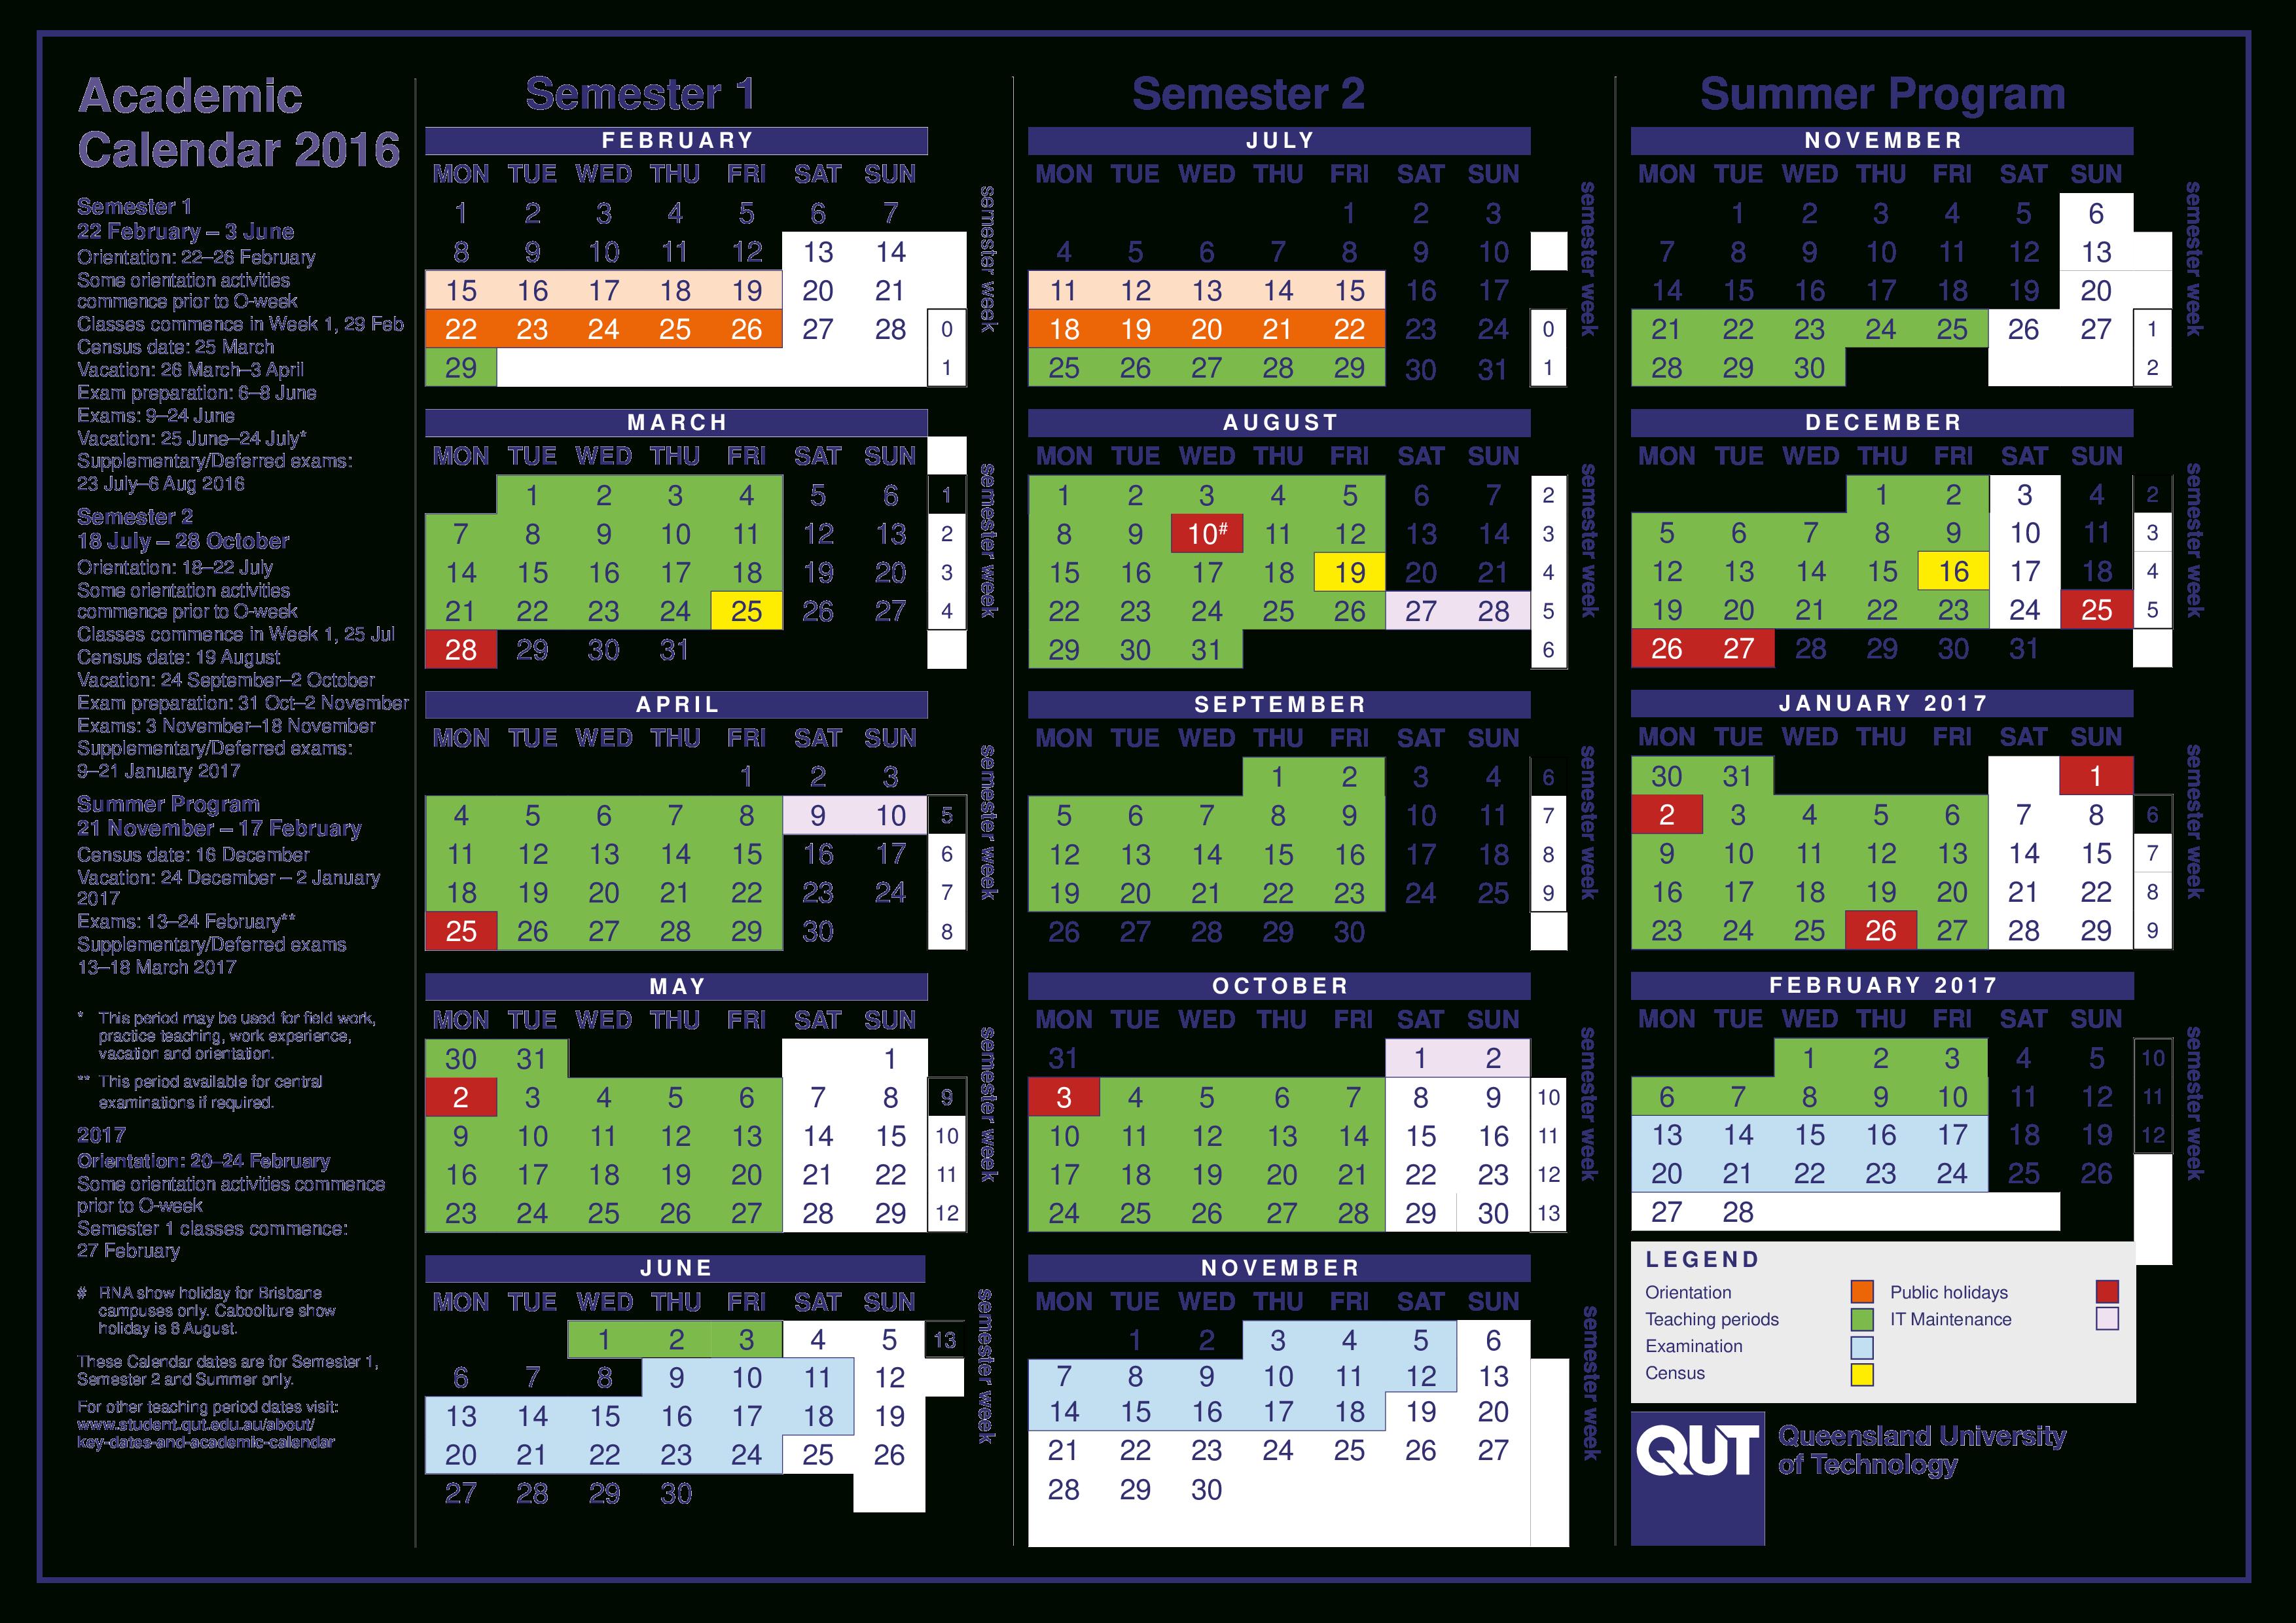 Printable Blank Academic Calendar | Templates At for Qut Academic Calendar 2020